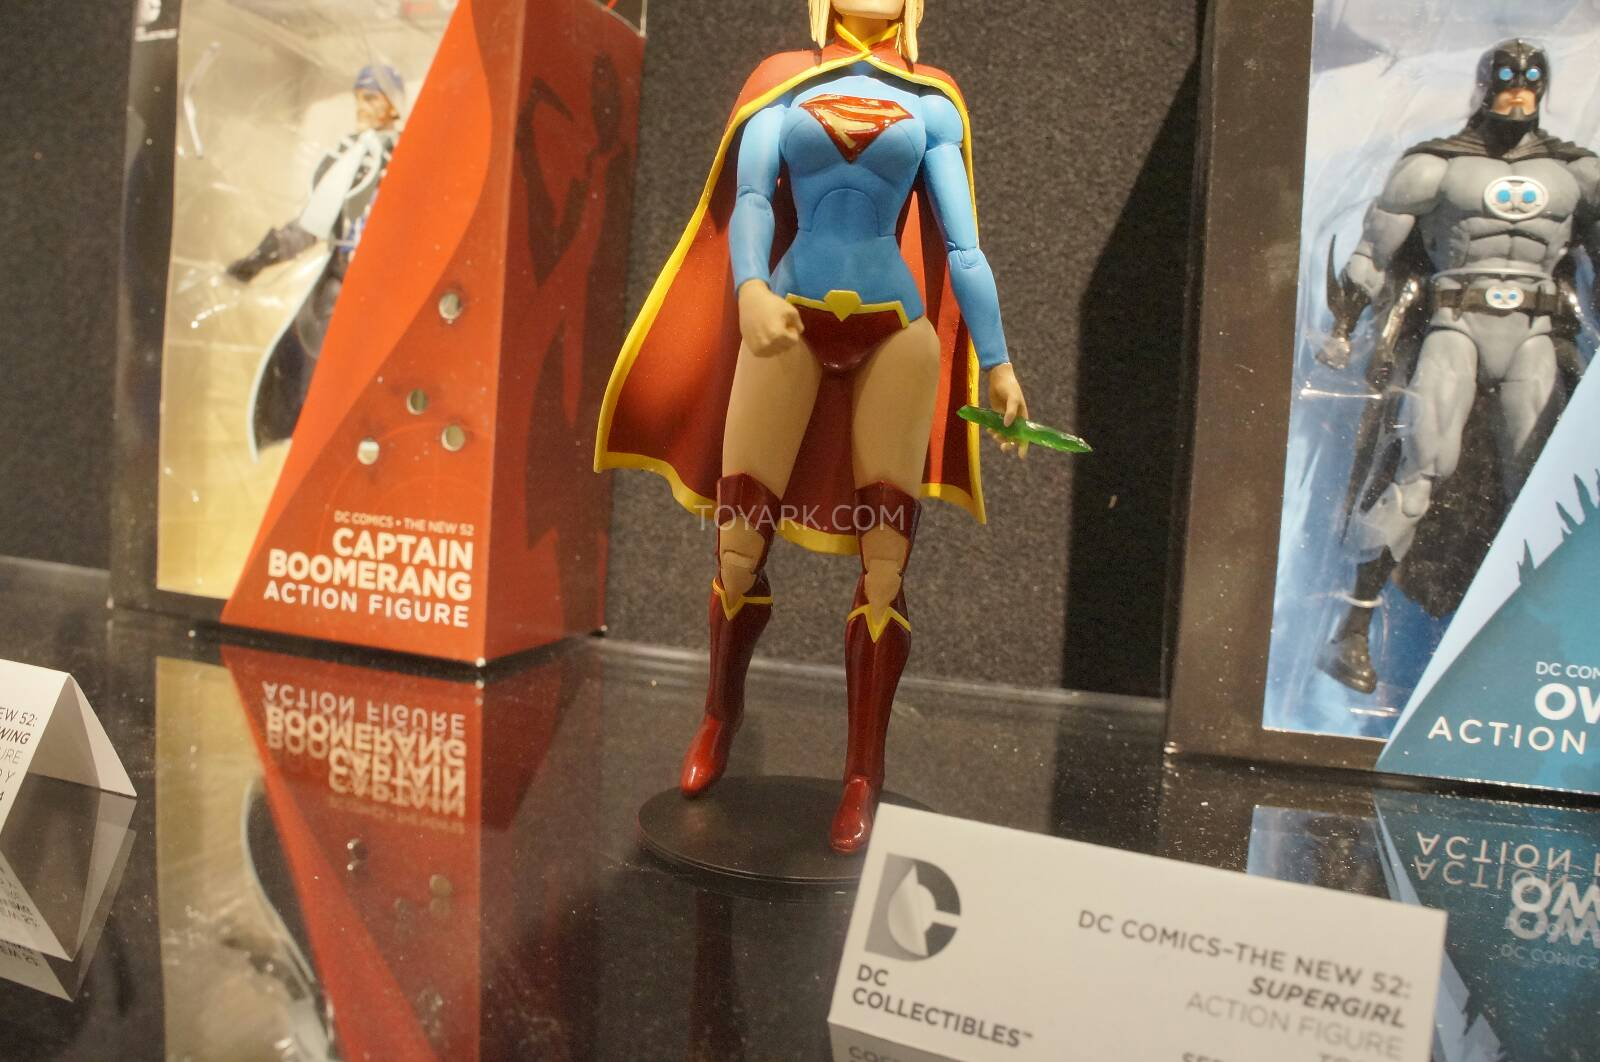 [Toy Fair 2014] DC Collectibles Toy-Fair-2014-DC-Collectibles-129